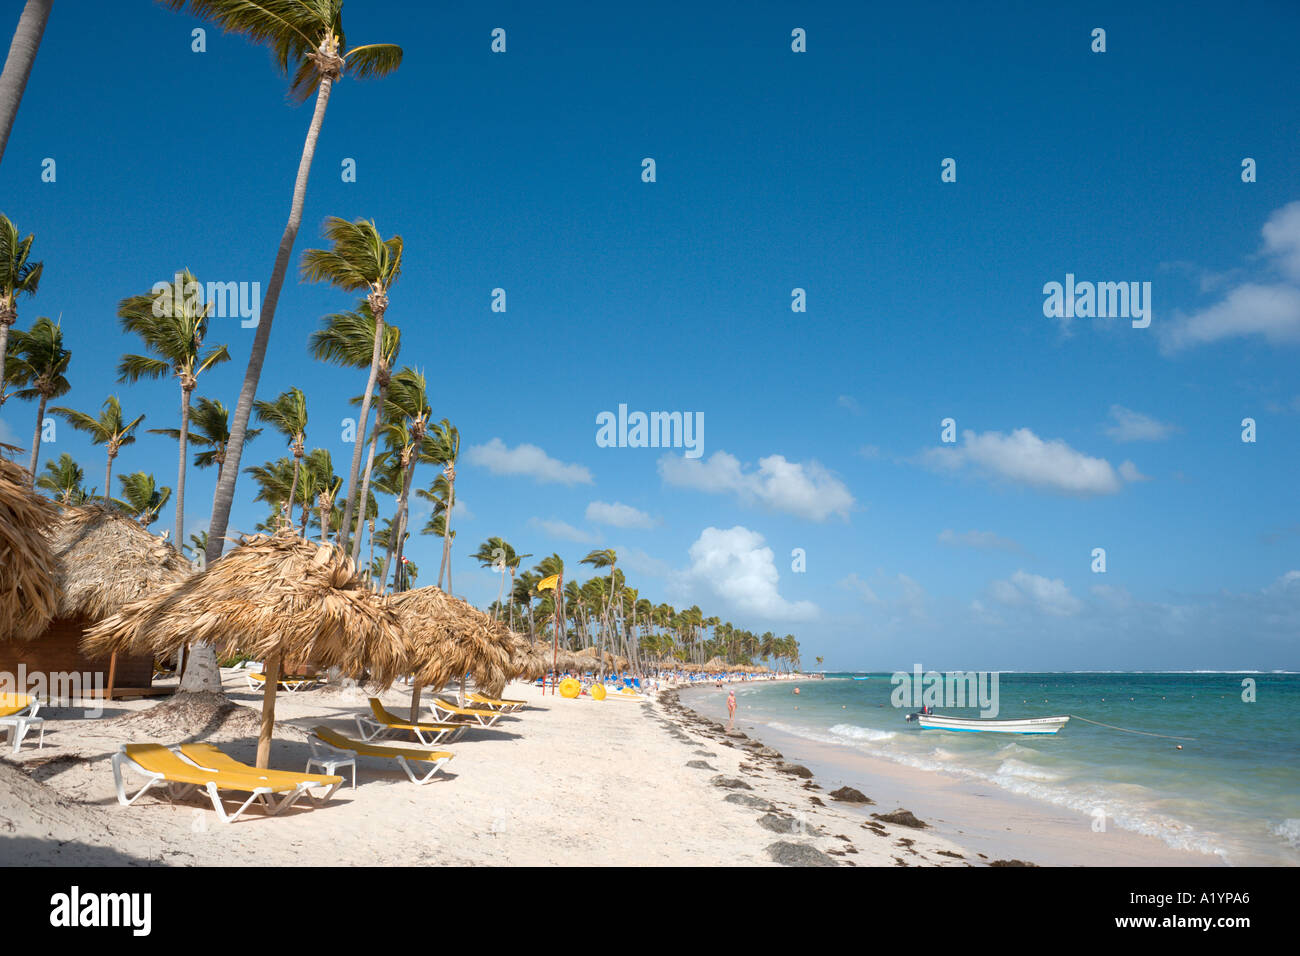 Bavaro Beach fuera Natura Park Hotel, Bavaro, Punta Cana, República Dominicana Imagen De Stock